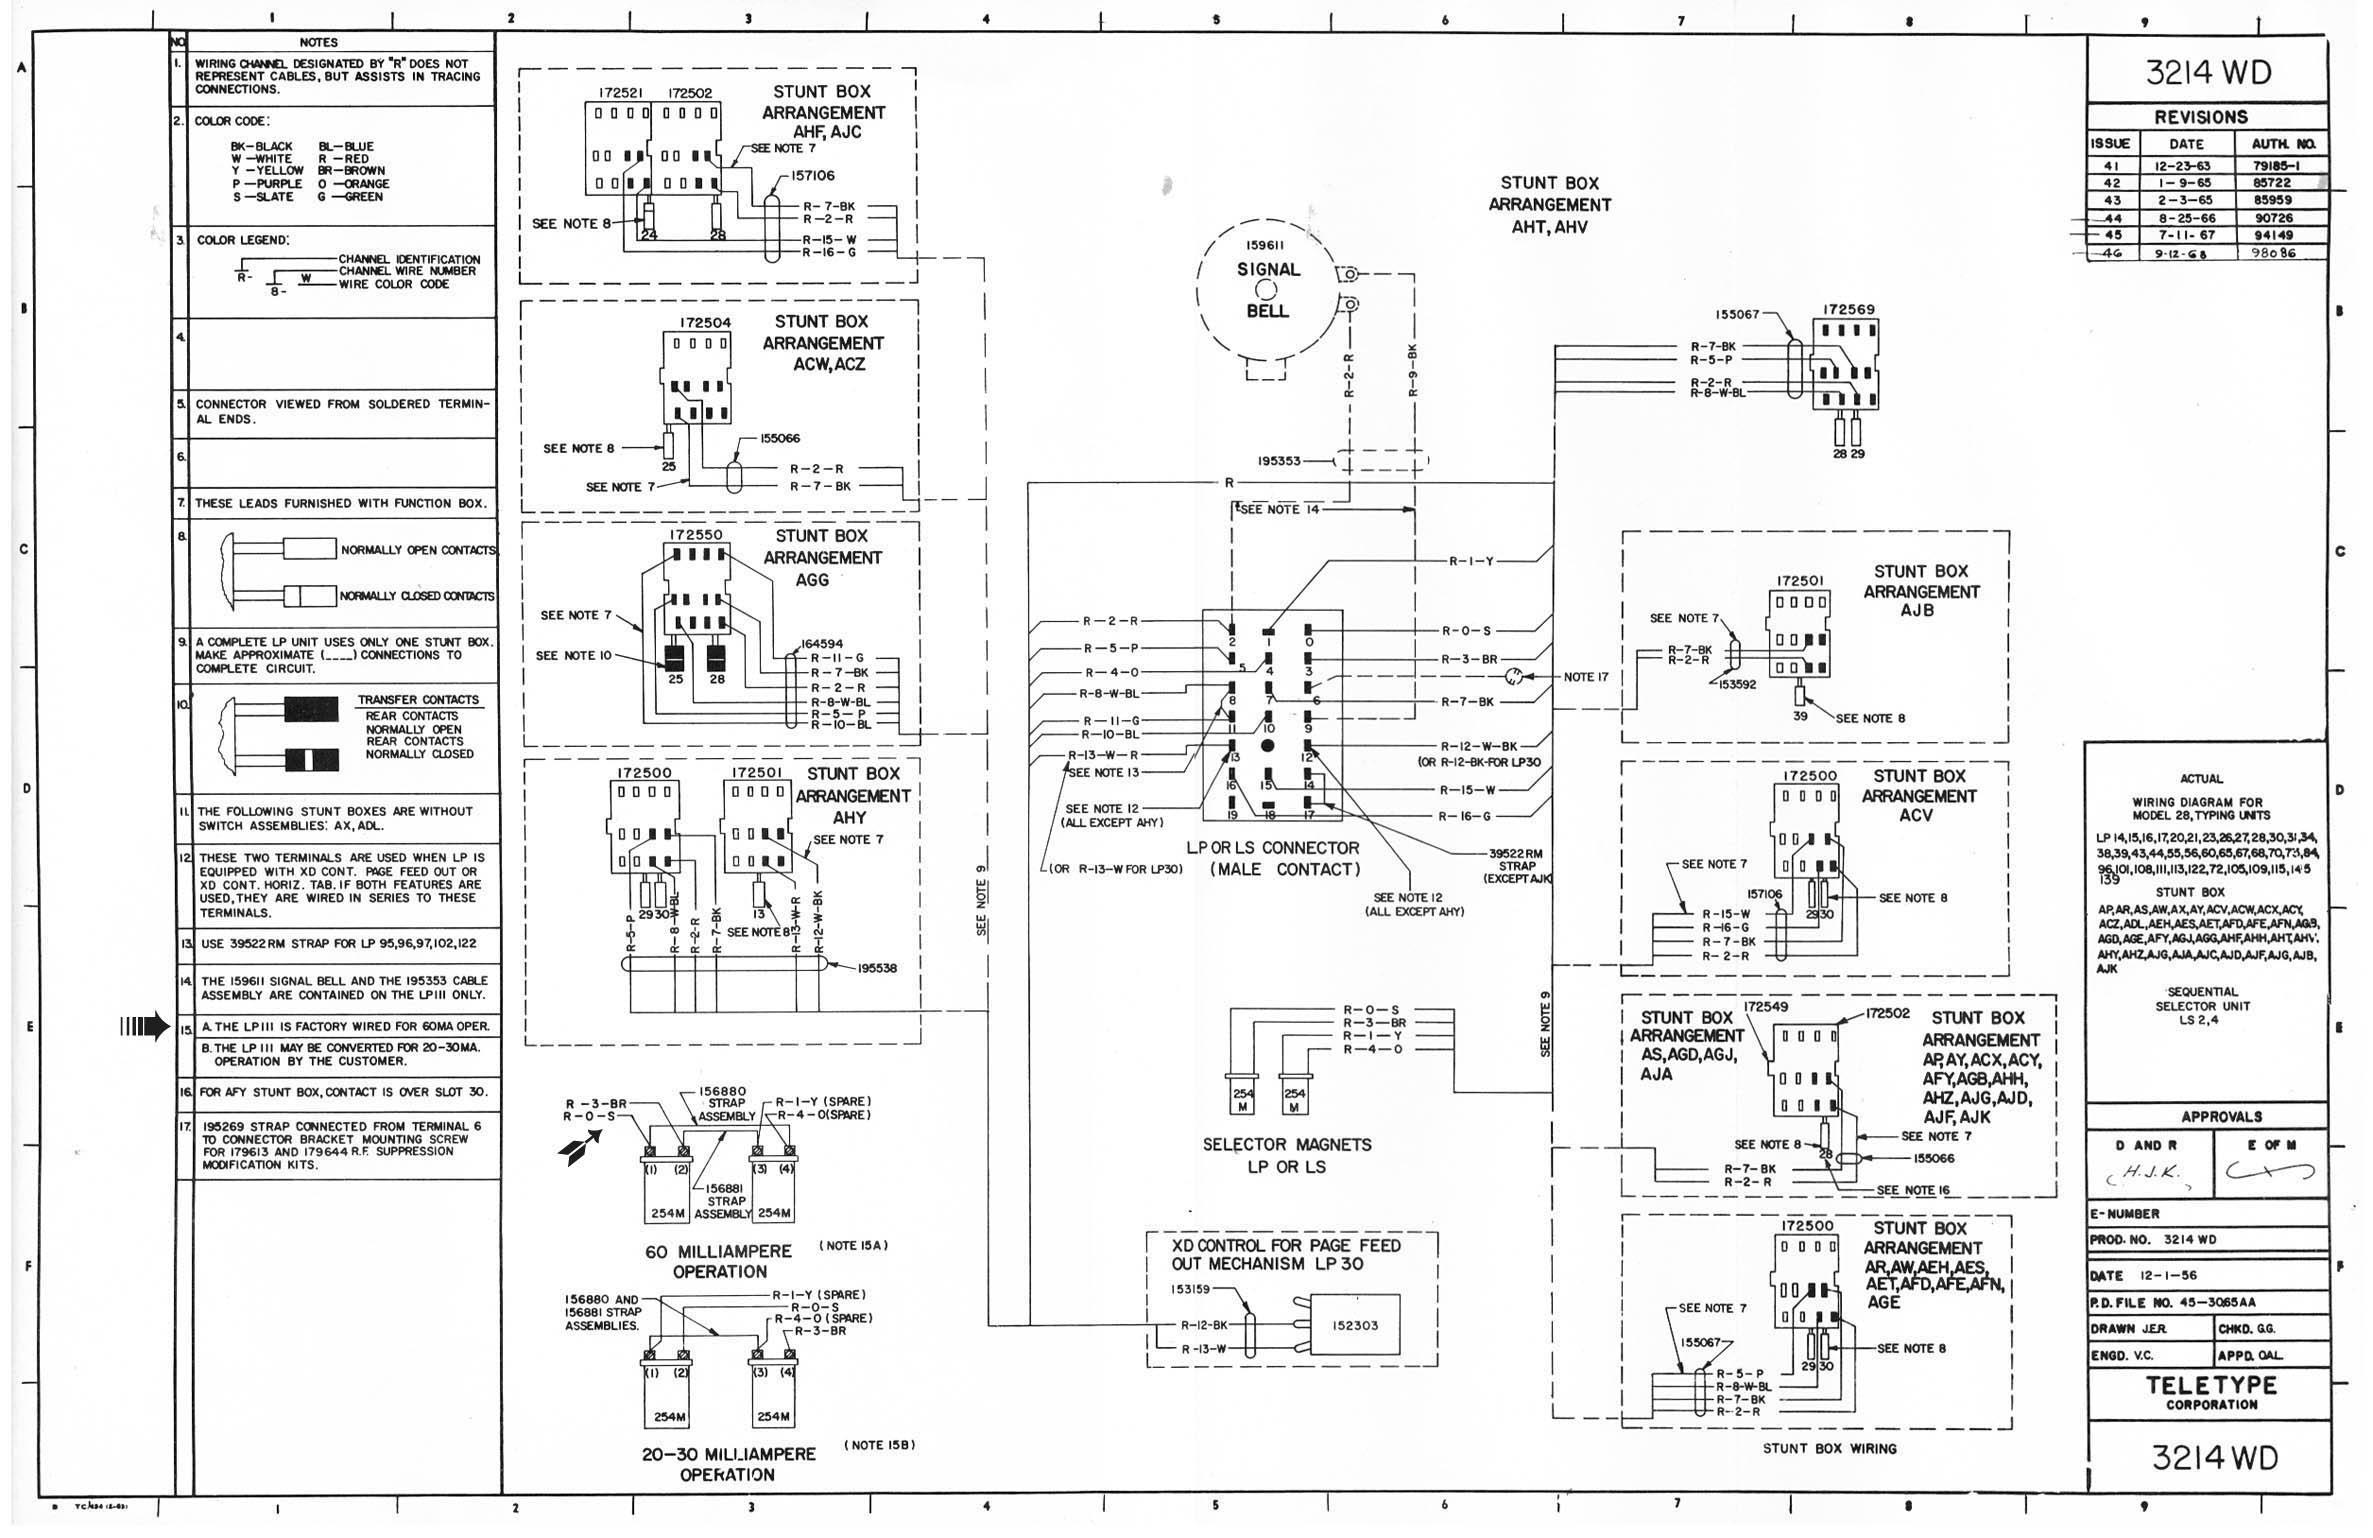 Home Run Electrical Wiring Diagrams | Wiring Diagram Database Home Run Wiring Diagram on